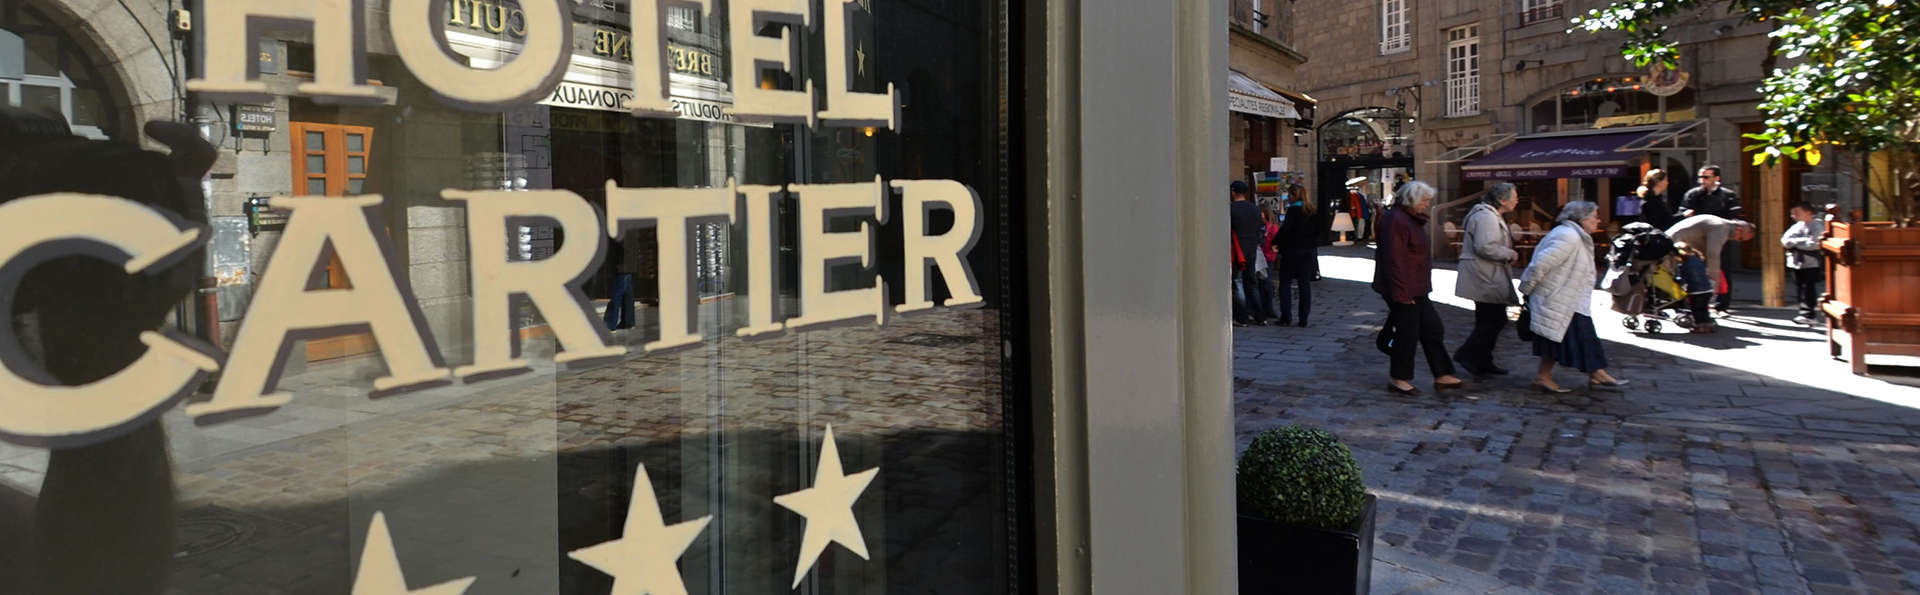 Hôtel Cartier - edit_Hotel_Cartier_autre.jpg